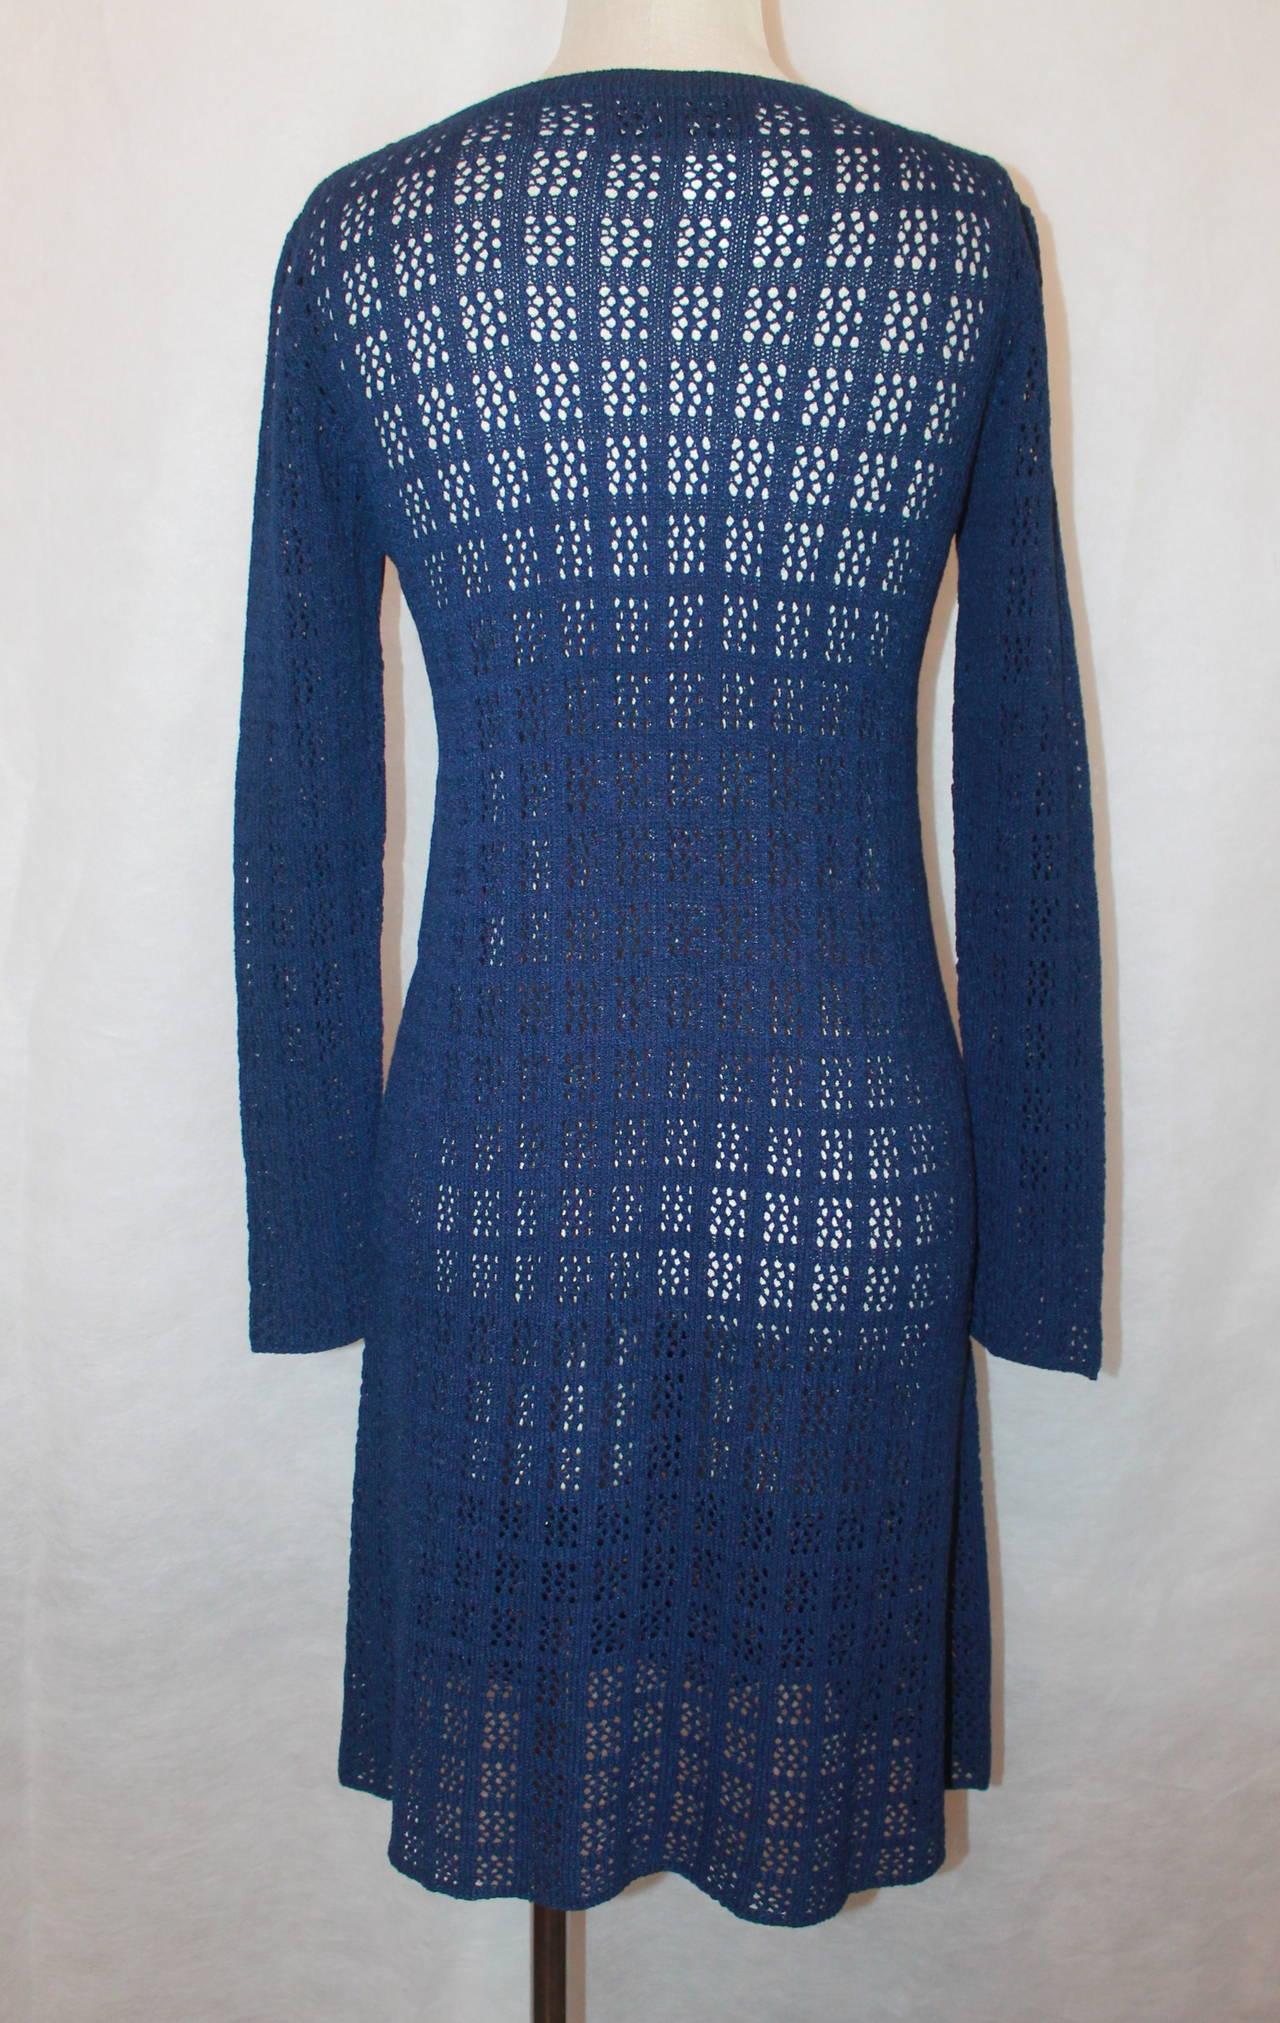 Adolfo 1960's Navy Open Knit Long Sleeve Dress - M 4